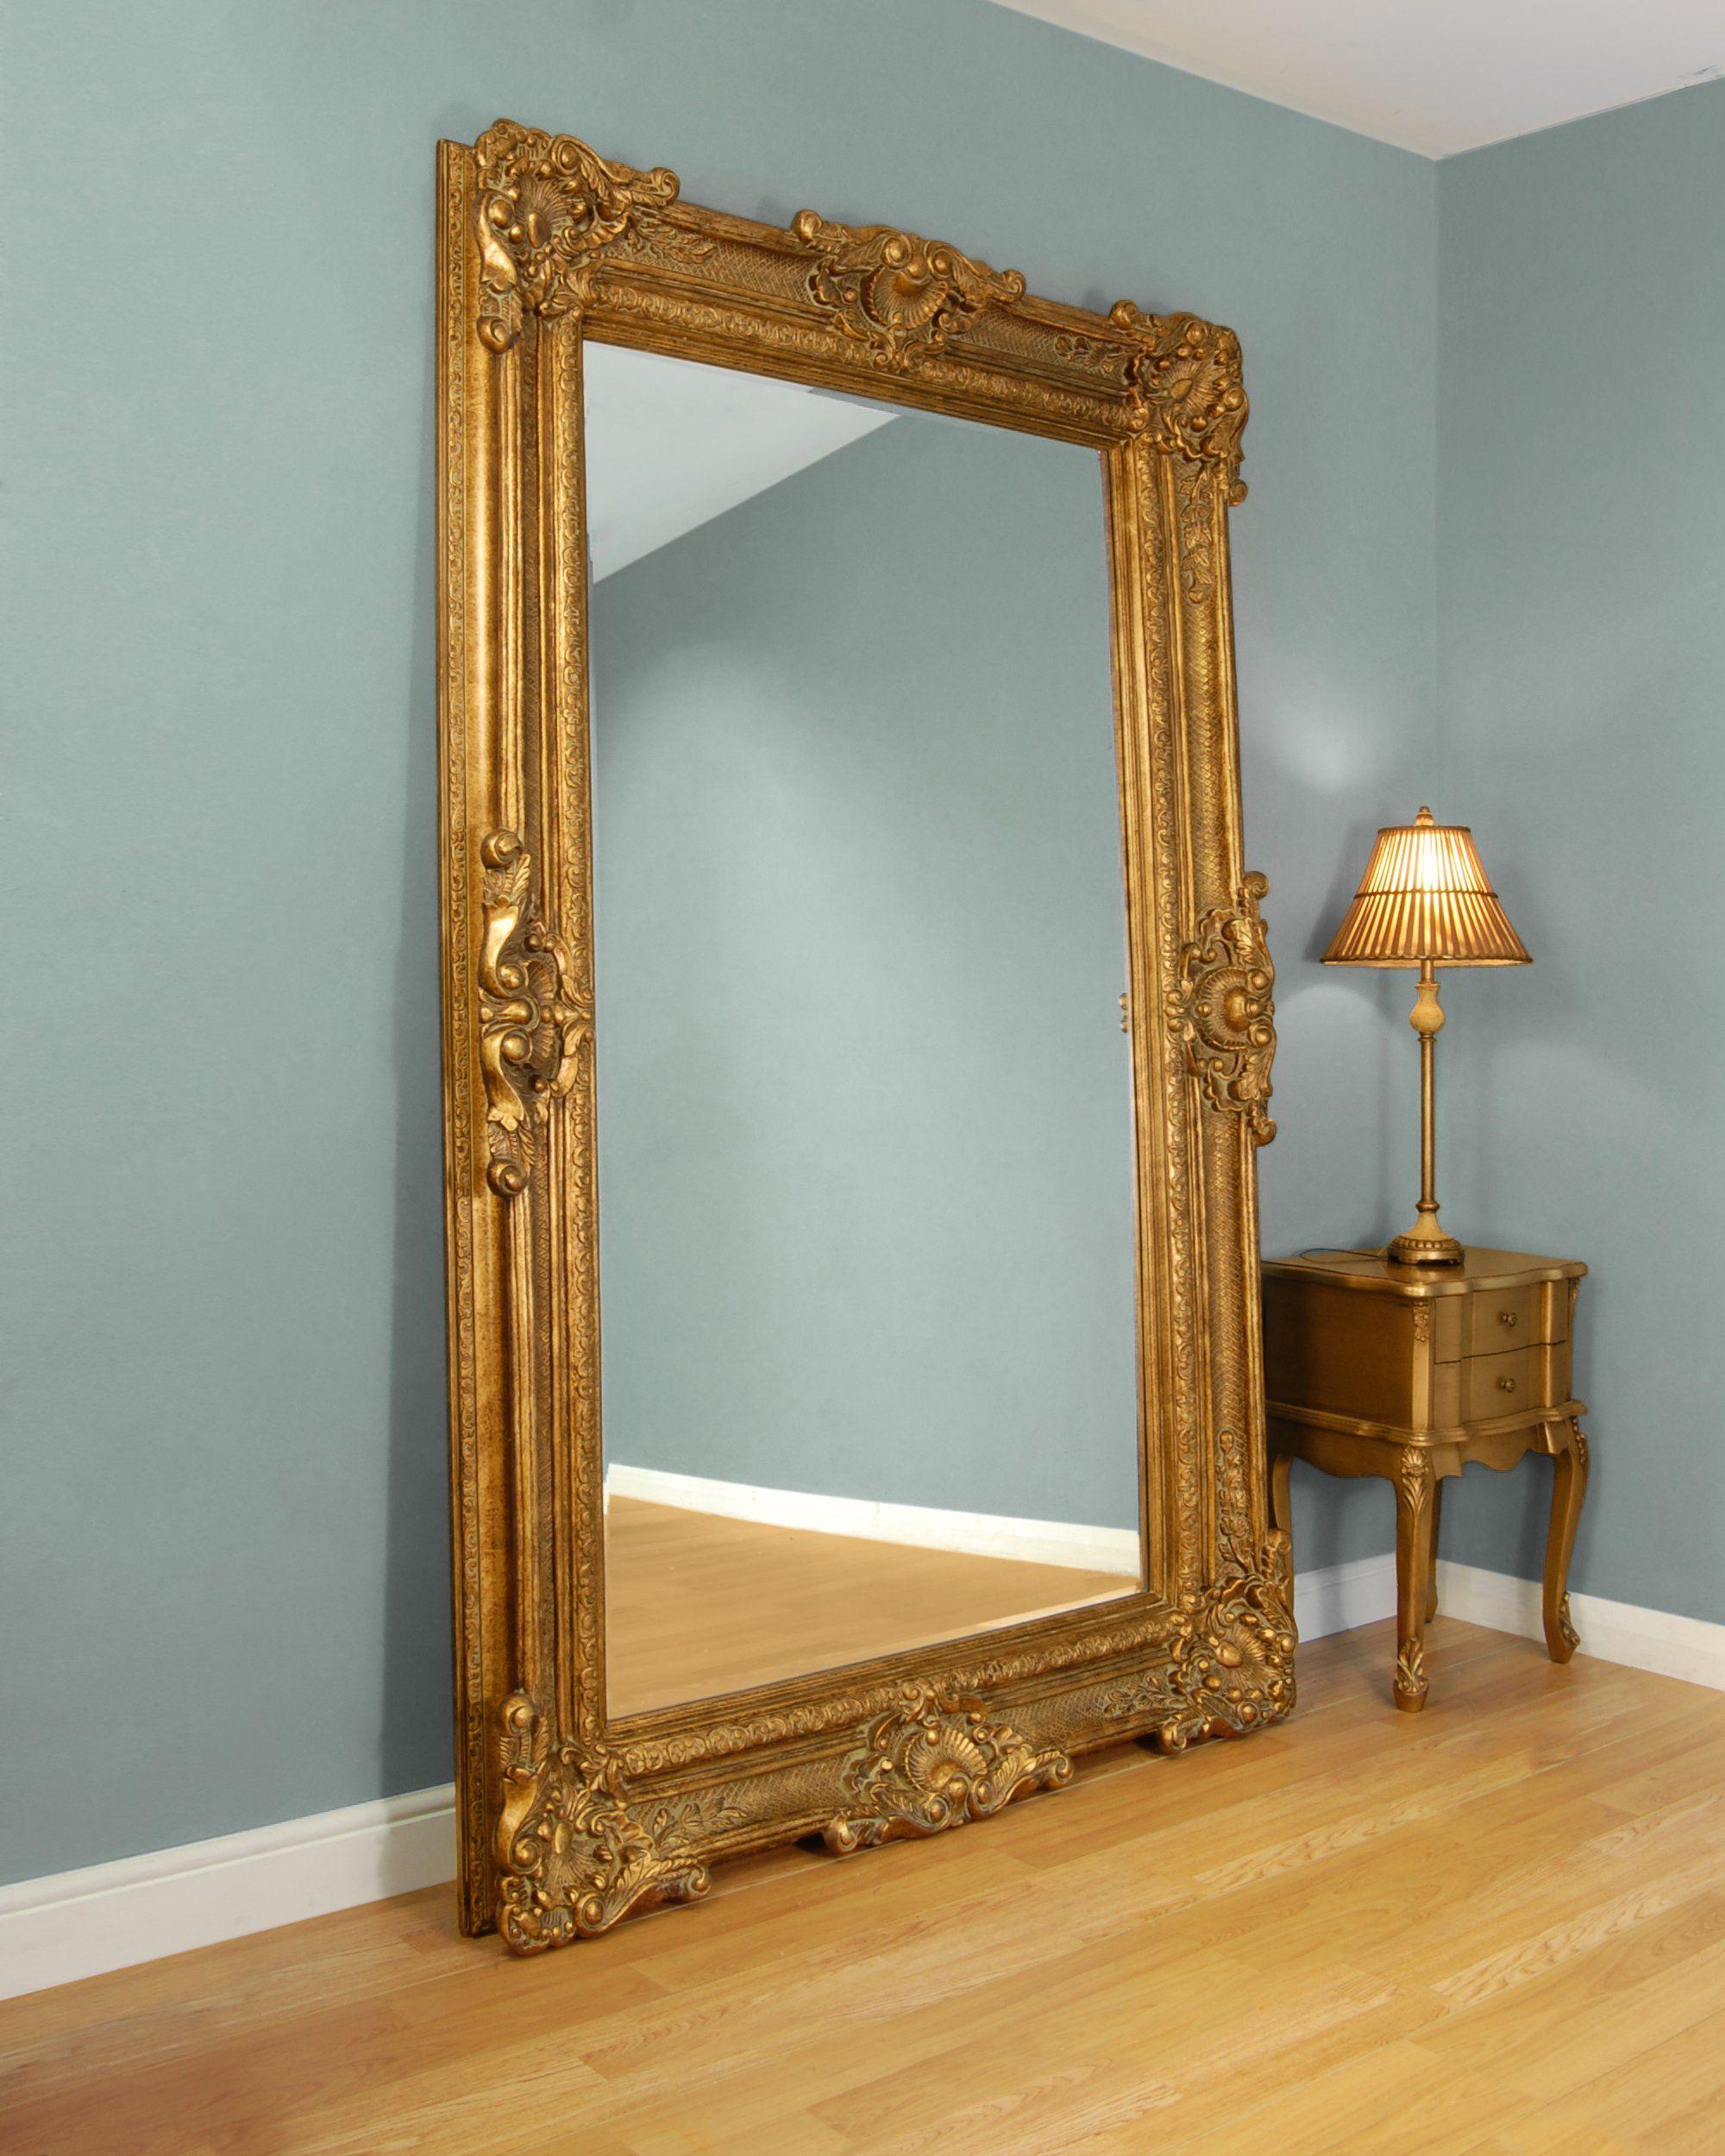 C M Bridgewater Large Gold Framed Leaner Mirror 225cm X 144cm Amazon Co Uk Kitchen Home Gold Floor Mirror Gold Mirror Living Room Mirror Frame Diy